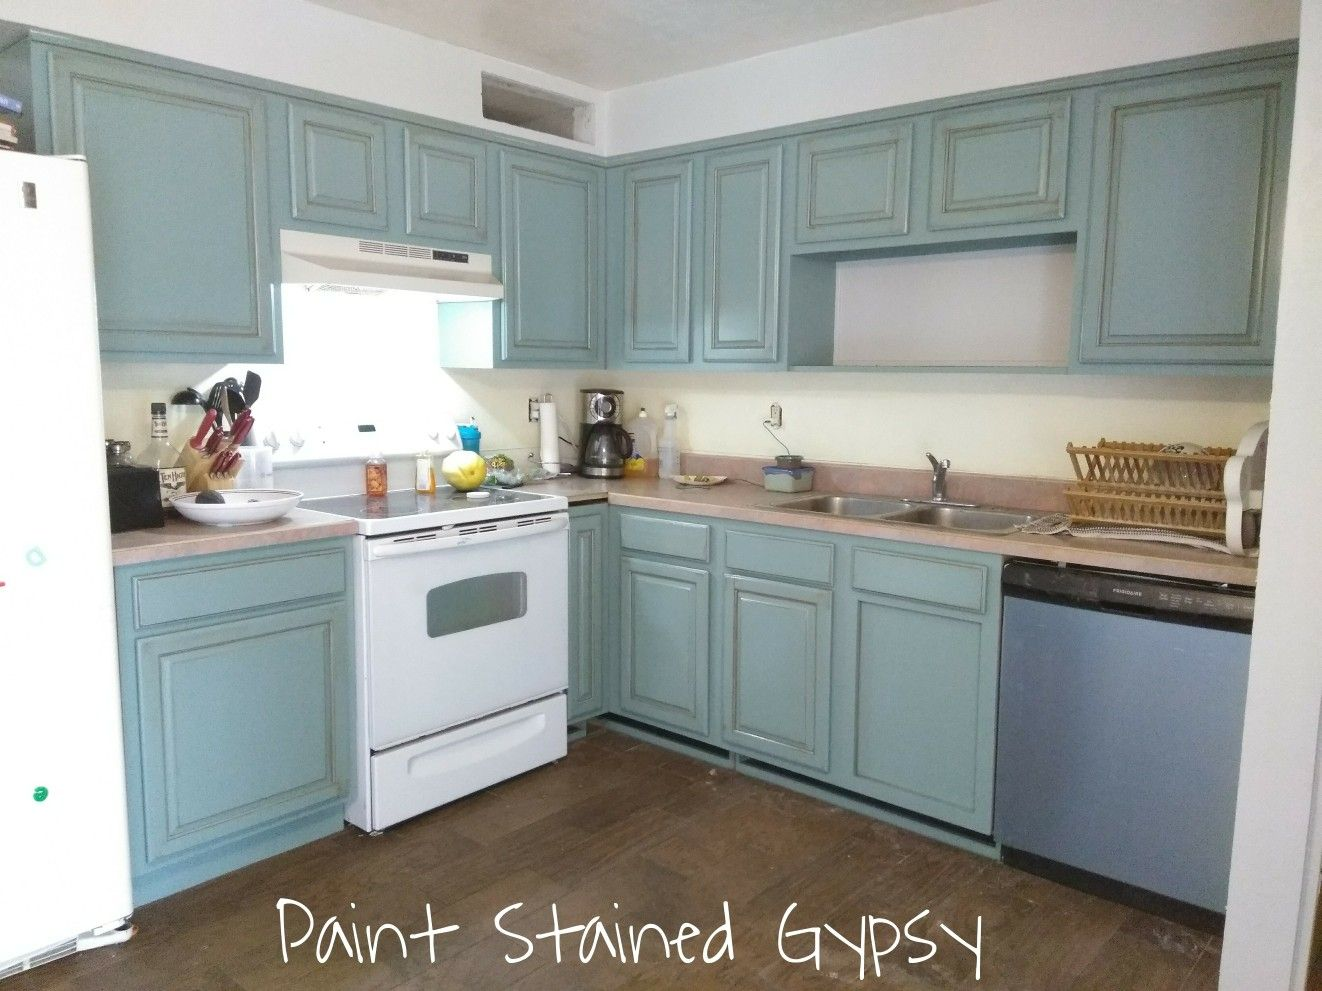 Farmhouse style glazed kitchen cabinets refinished in Eucalyptus ...